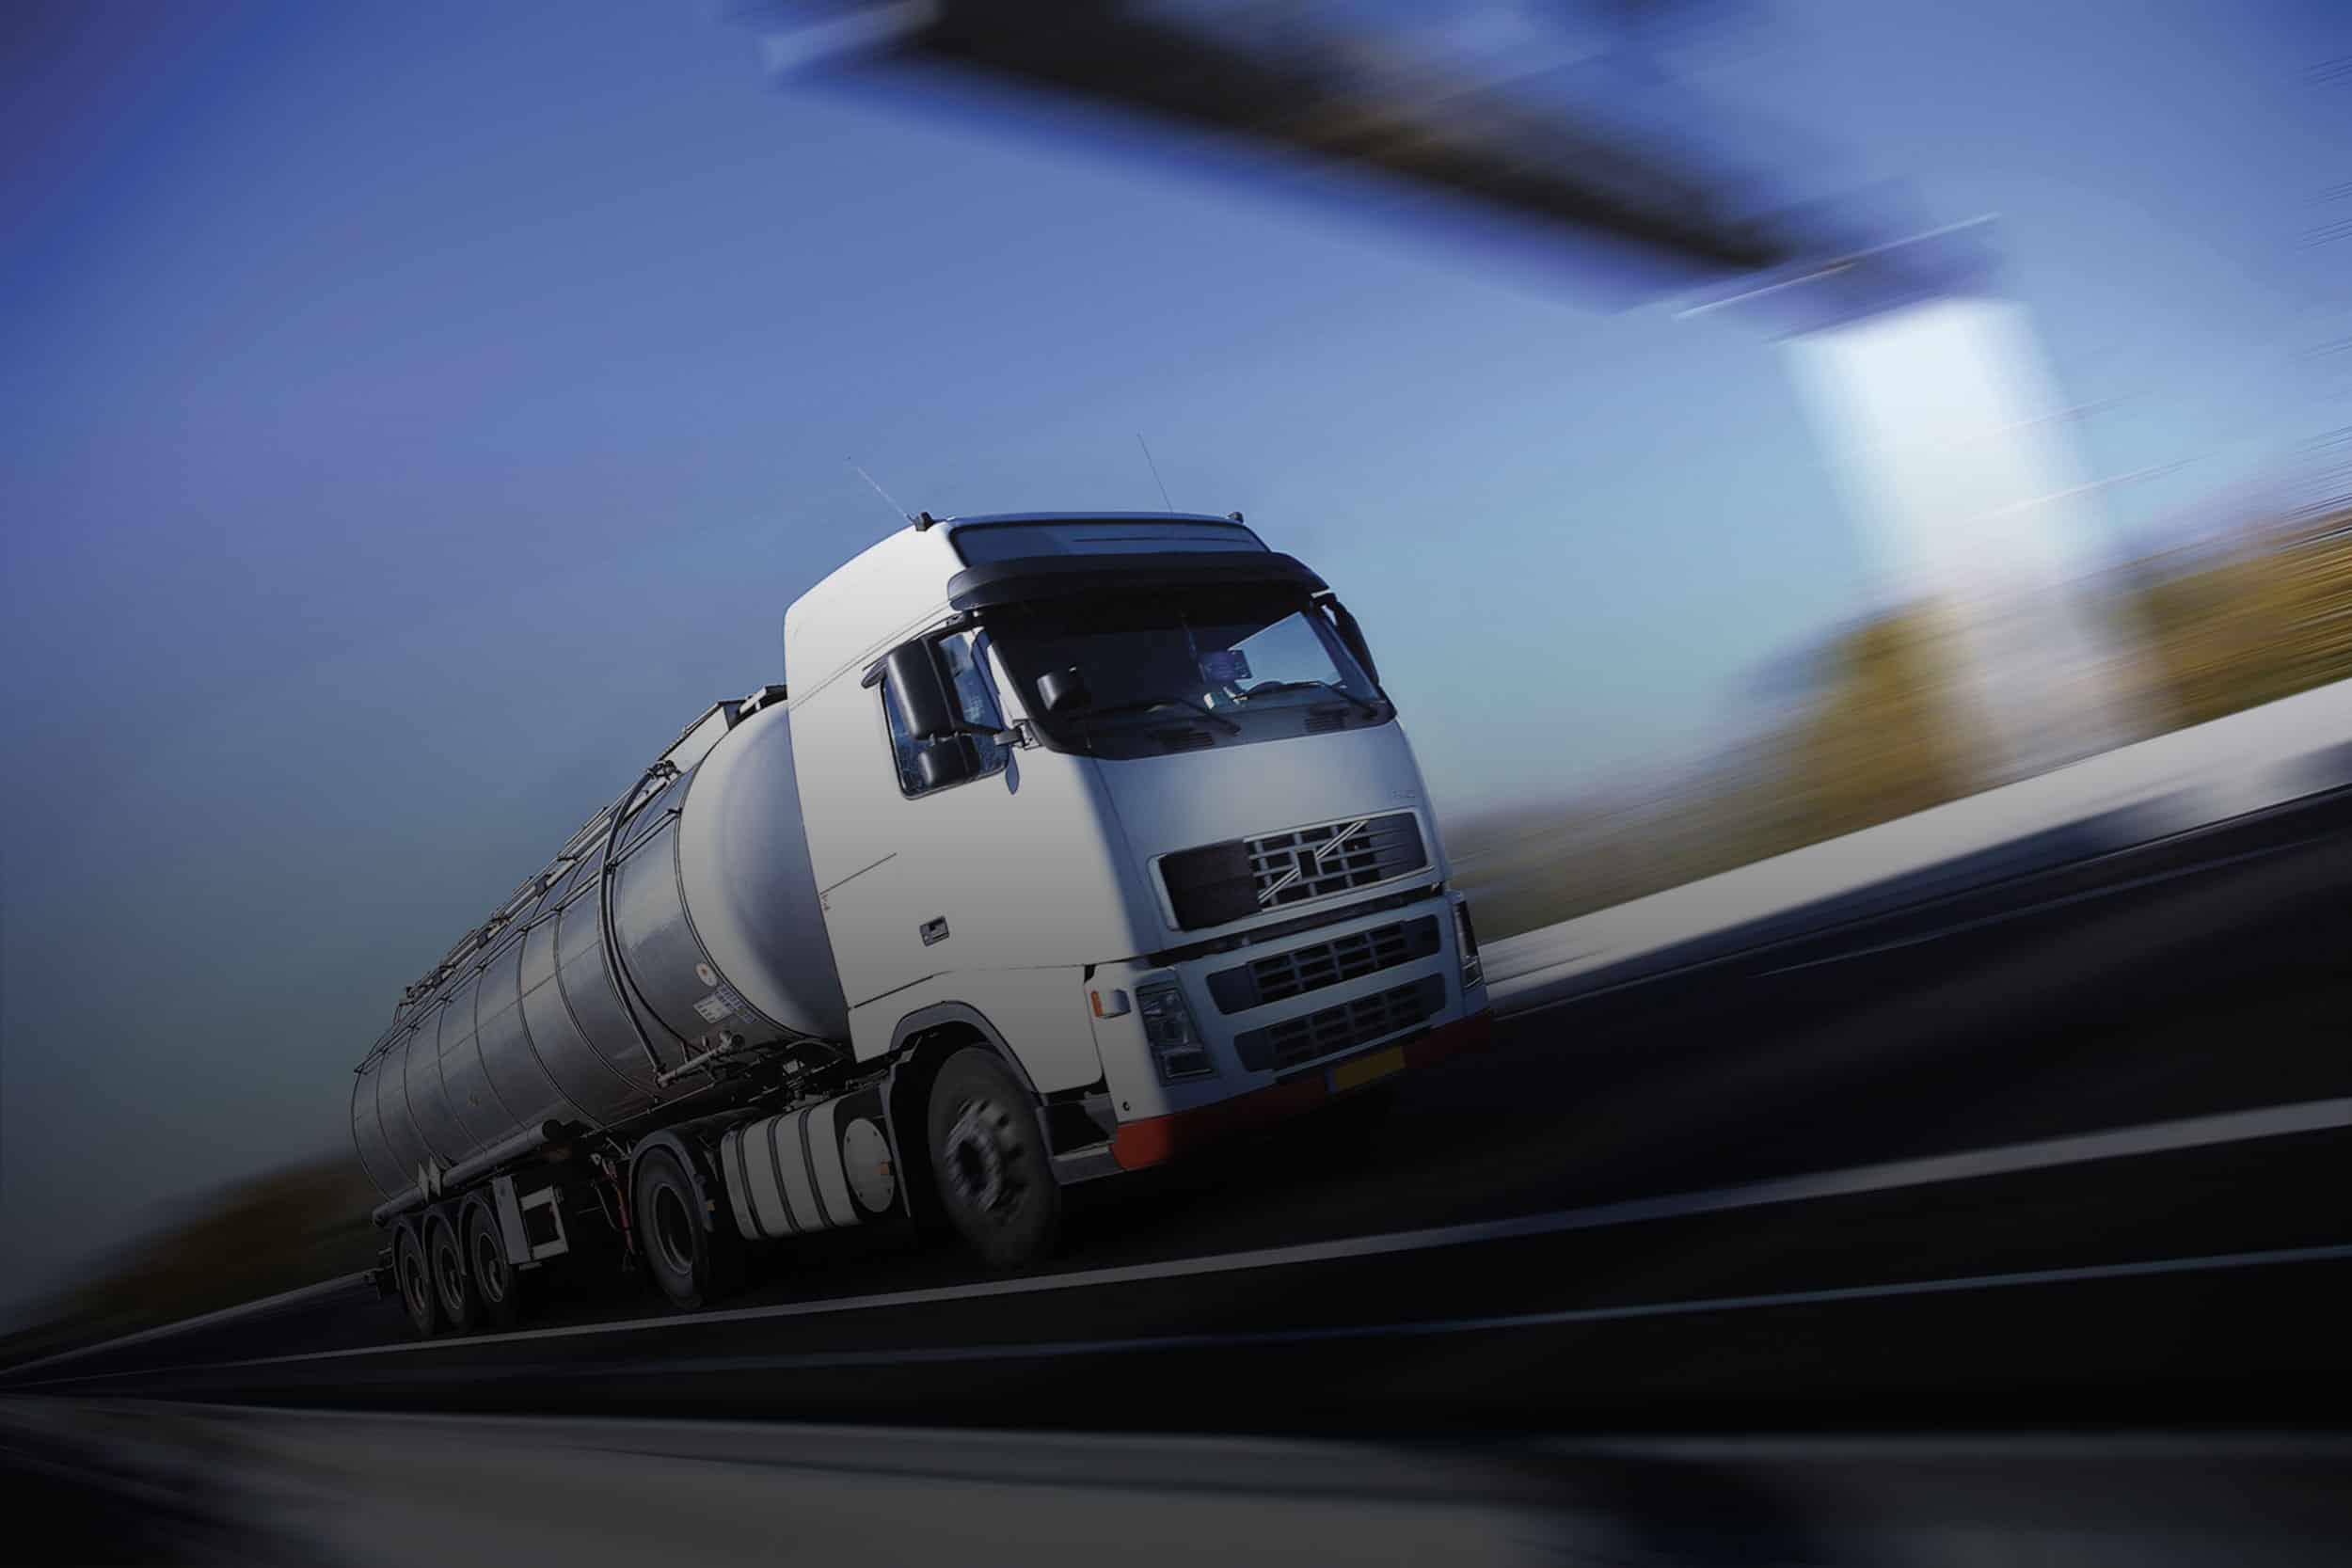 http://transnautic.de/wp-content/uploads/2015/09/White-Truck-single.jpg